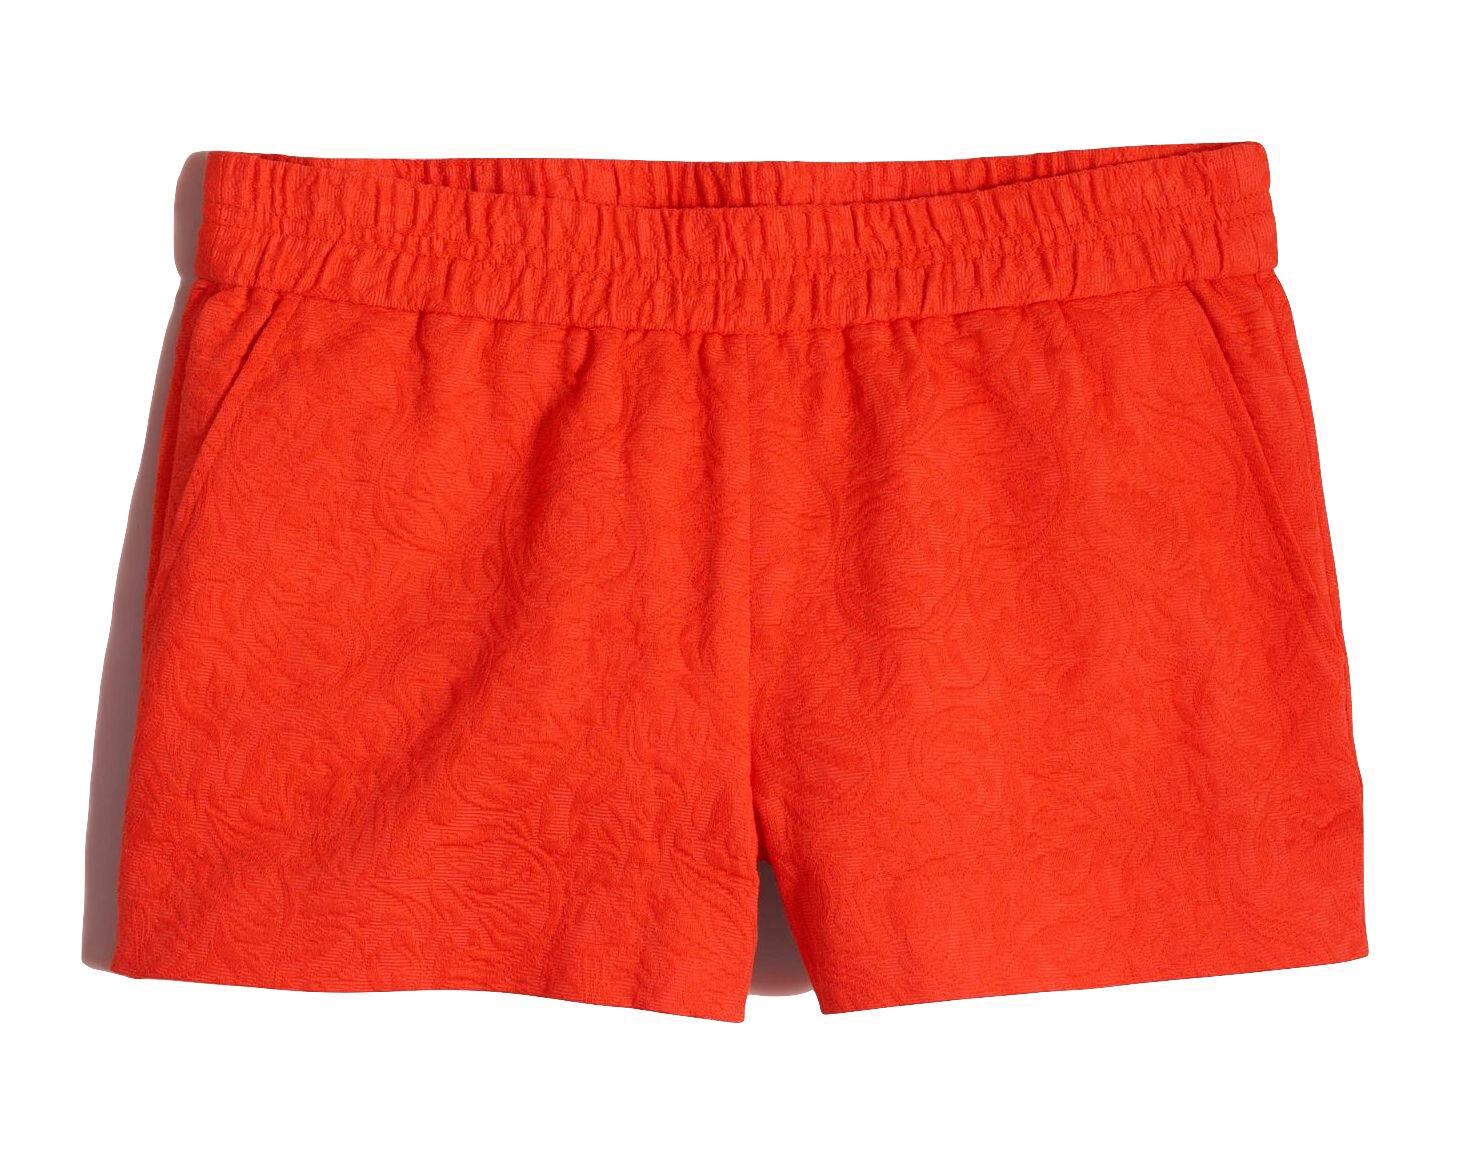 J Crew Factory - Women's 8 (M) - Fiery Sunset Floral Jacquard Boardwalk Shorts